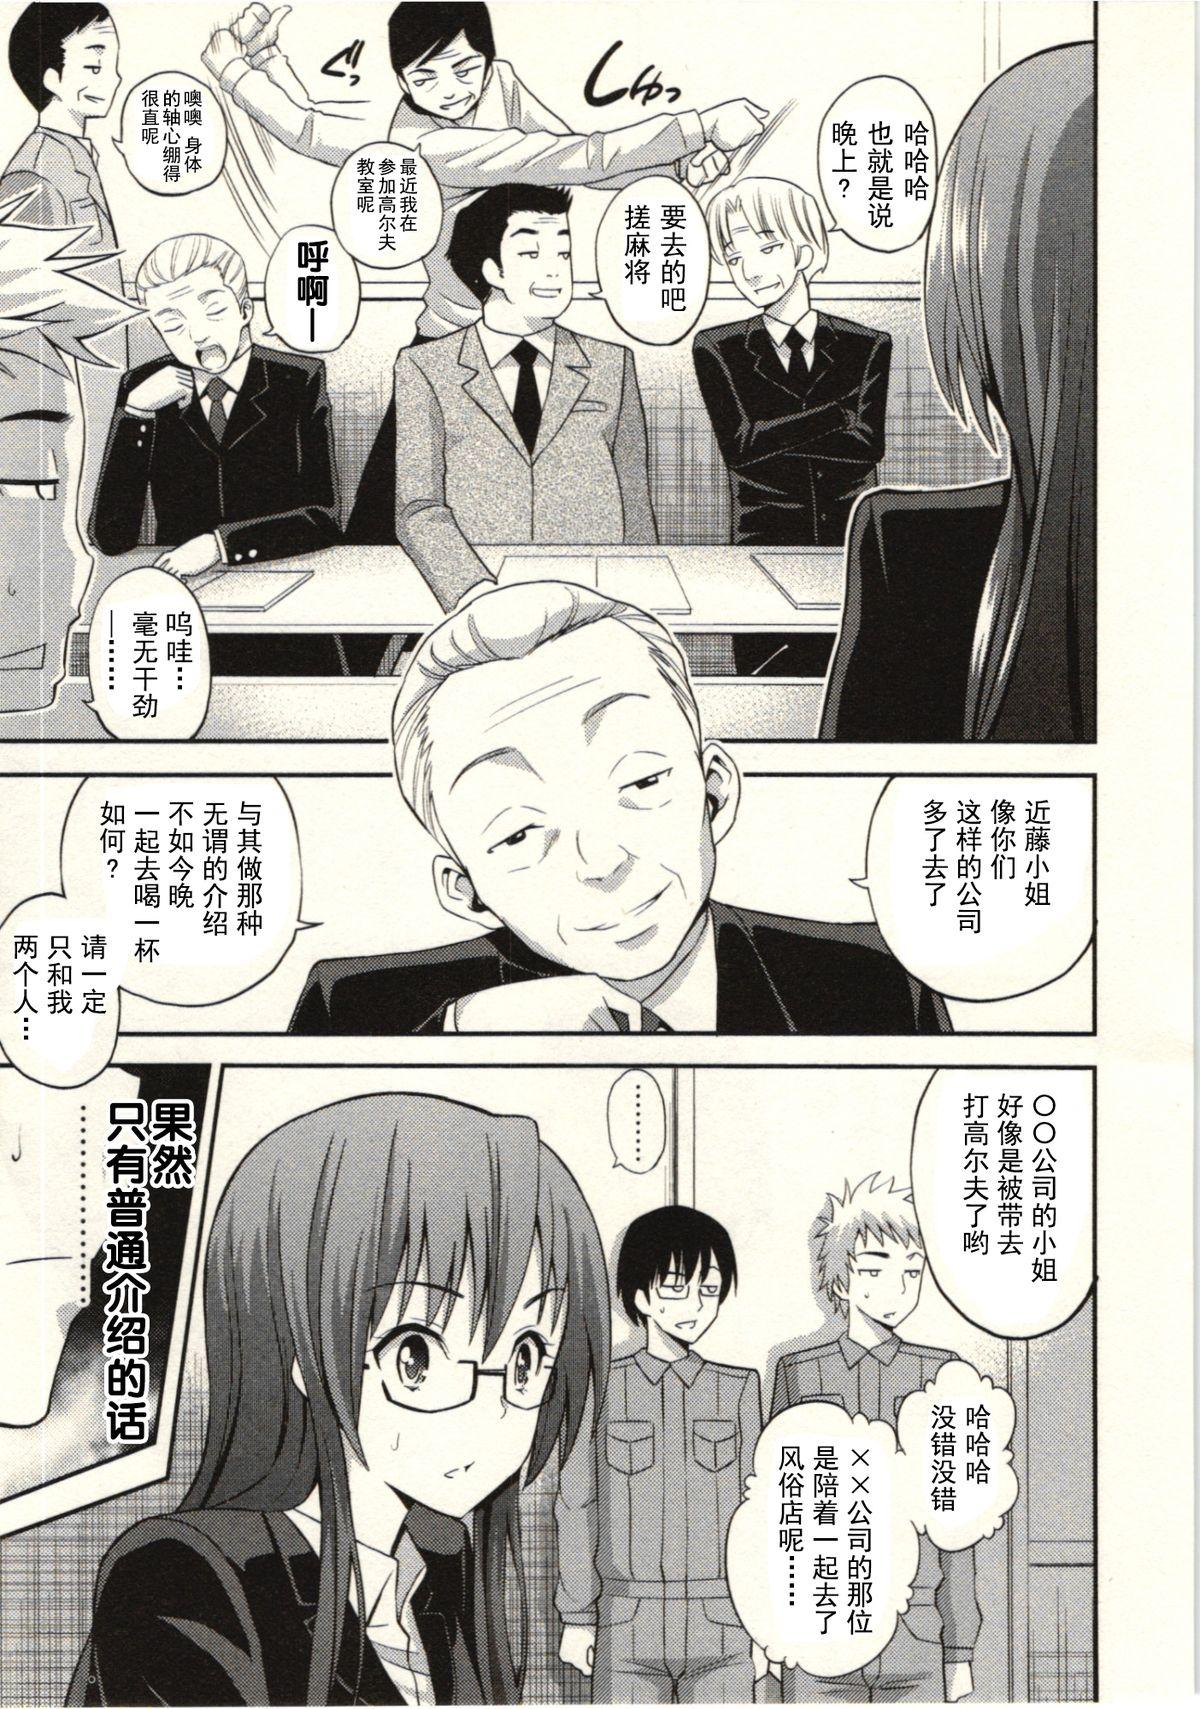 Tadashii Majutsu no Asobikata - The right way of playing of magic. 147